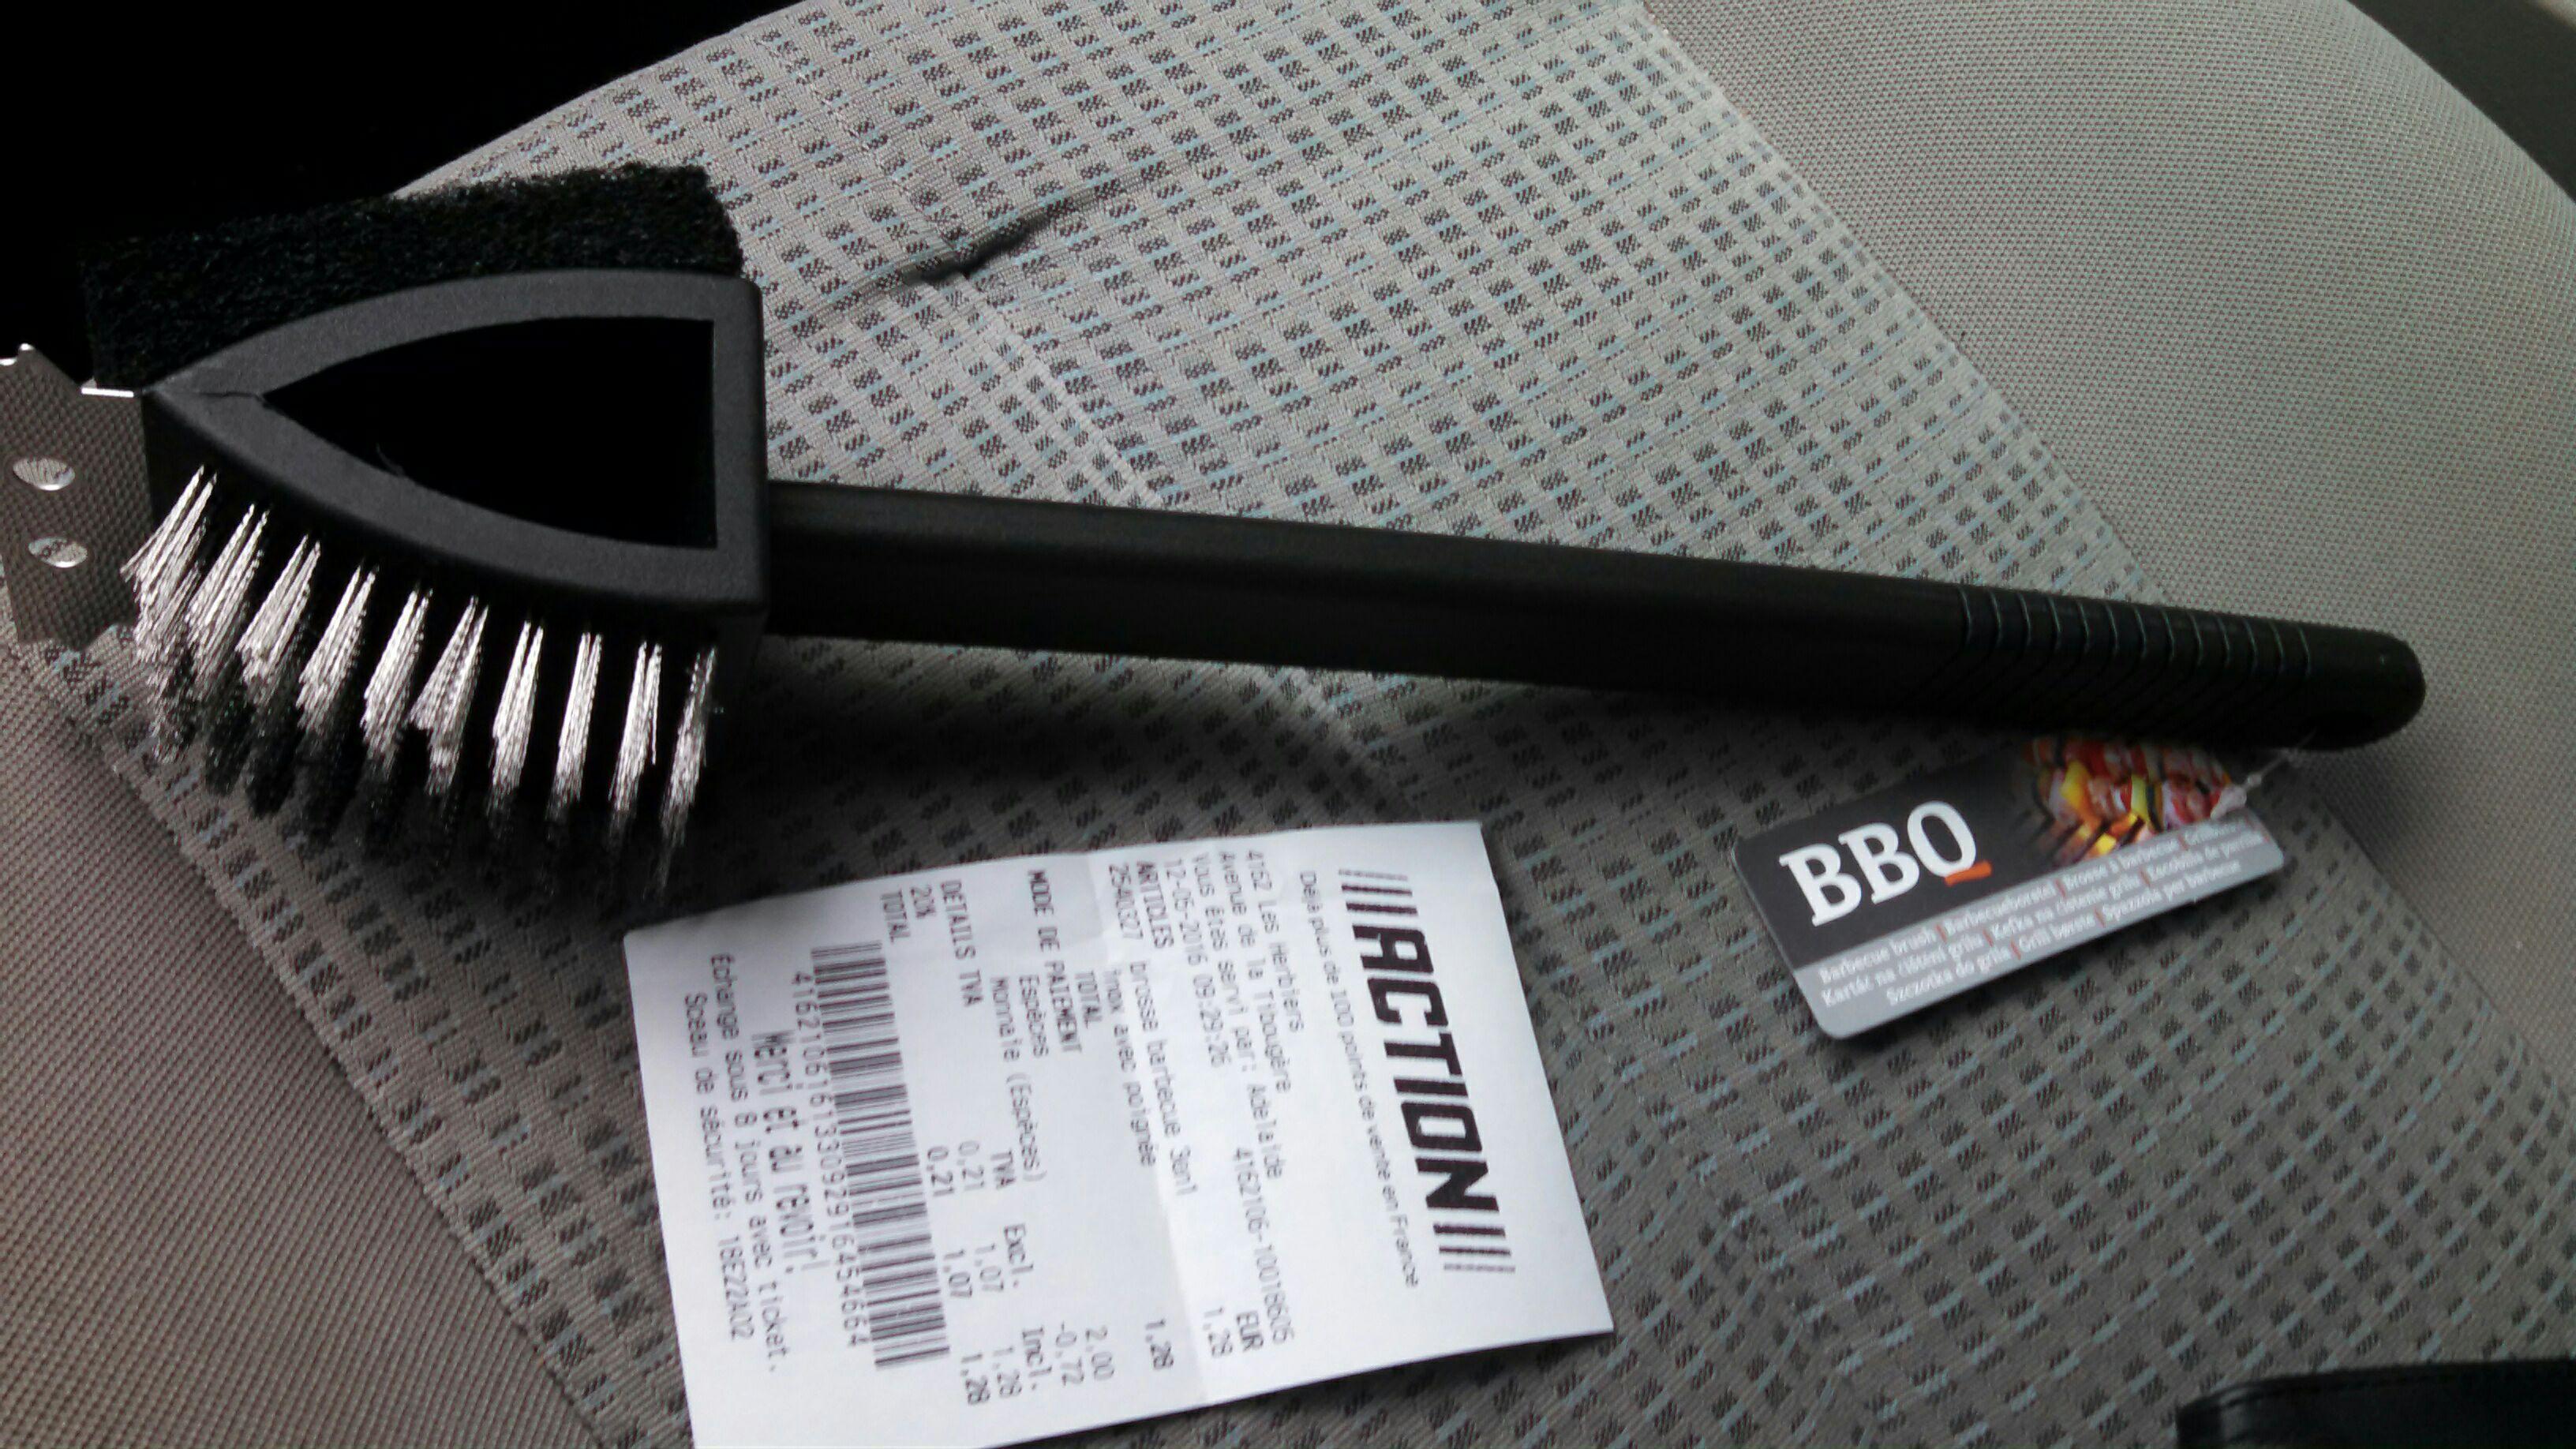 Brosse Barcbecue 3 en 1 - Inox avec poignée